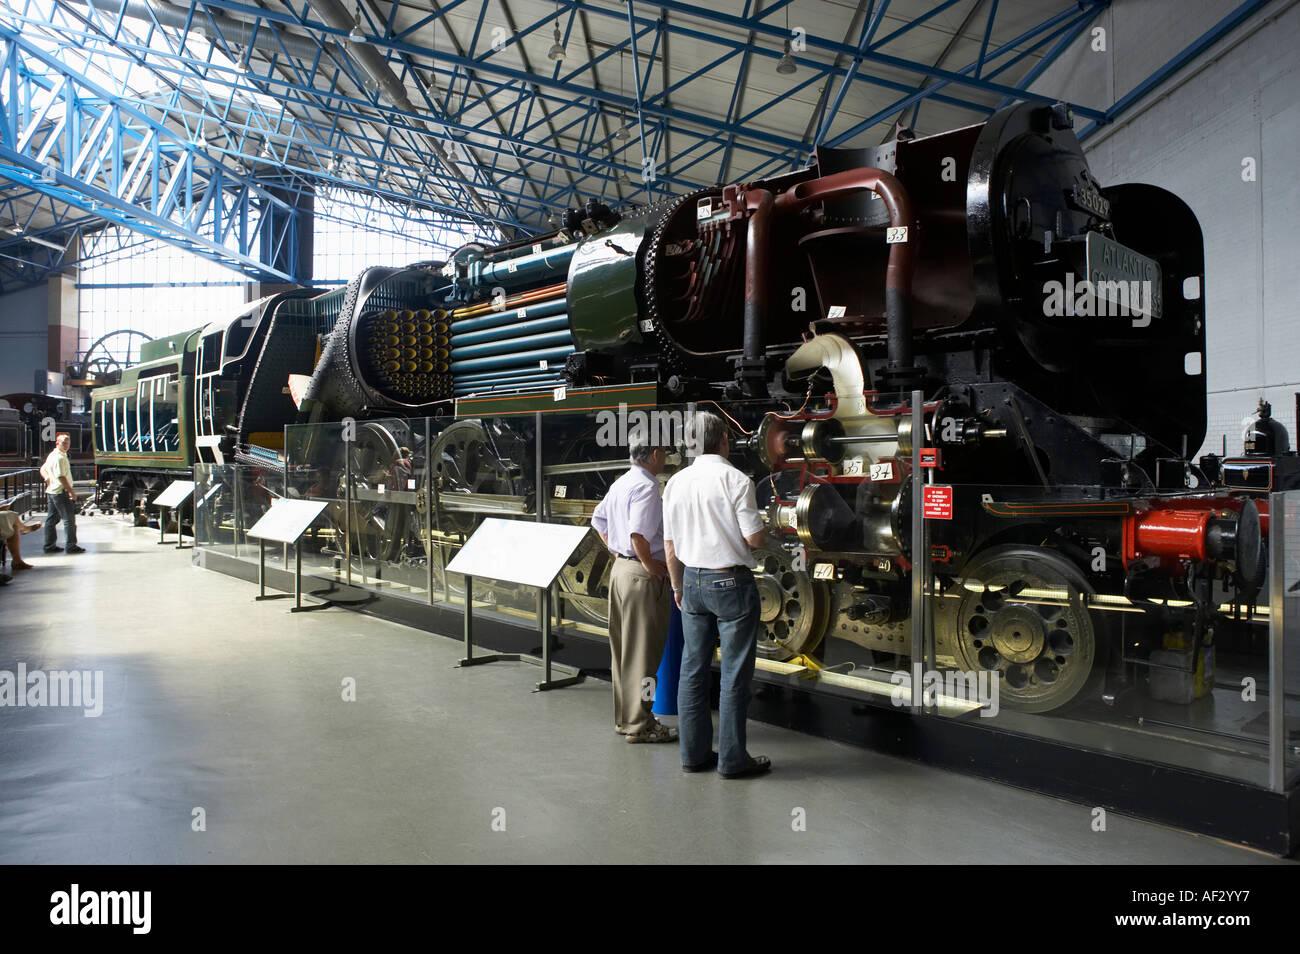 Steam Locomotive Cutaway Diagram Trusted Wiring Diagrams Engine Cut Away View Of In National Railway Museum York